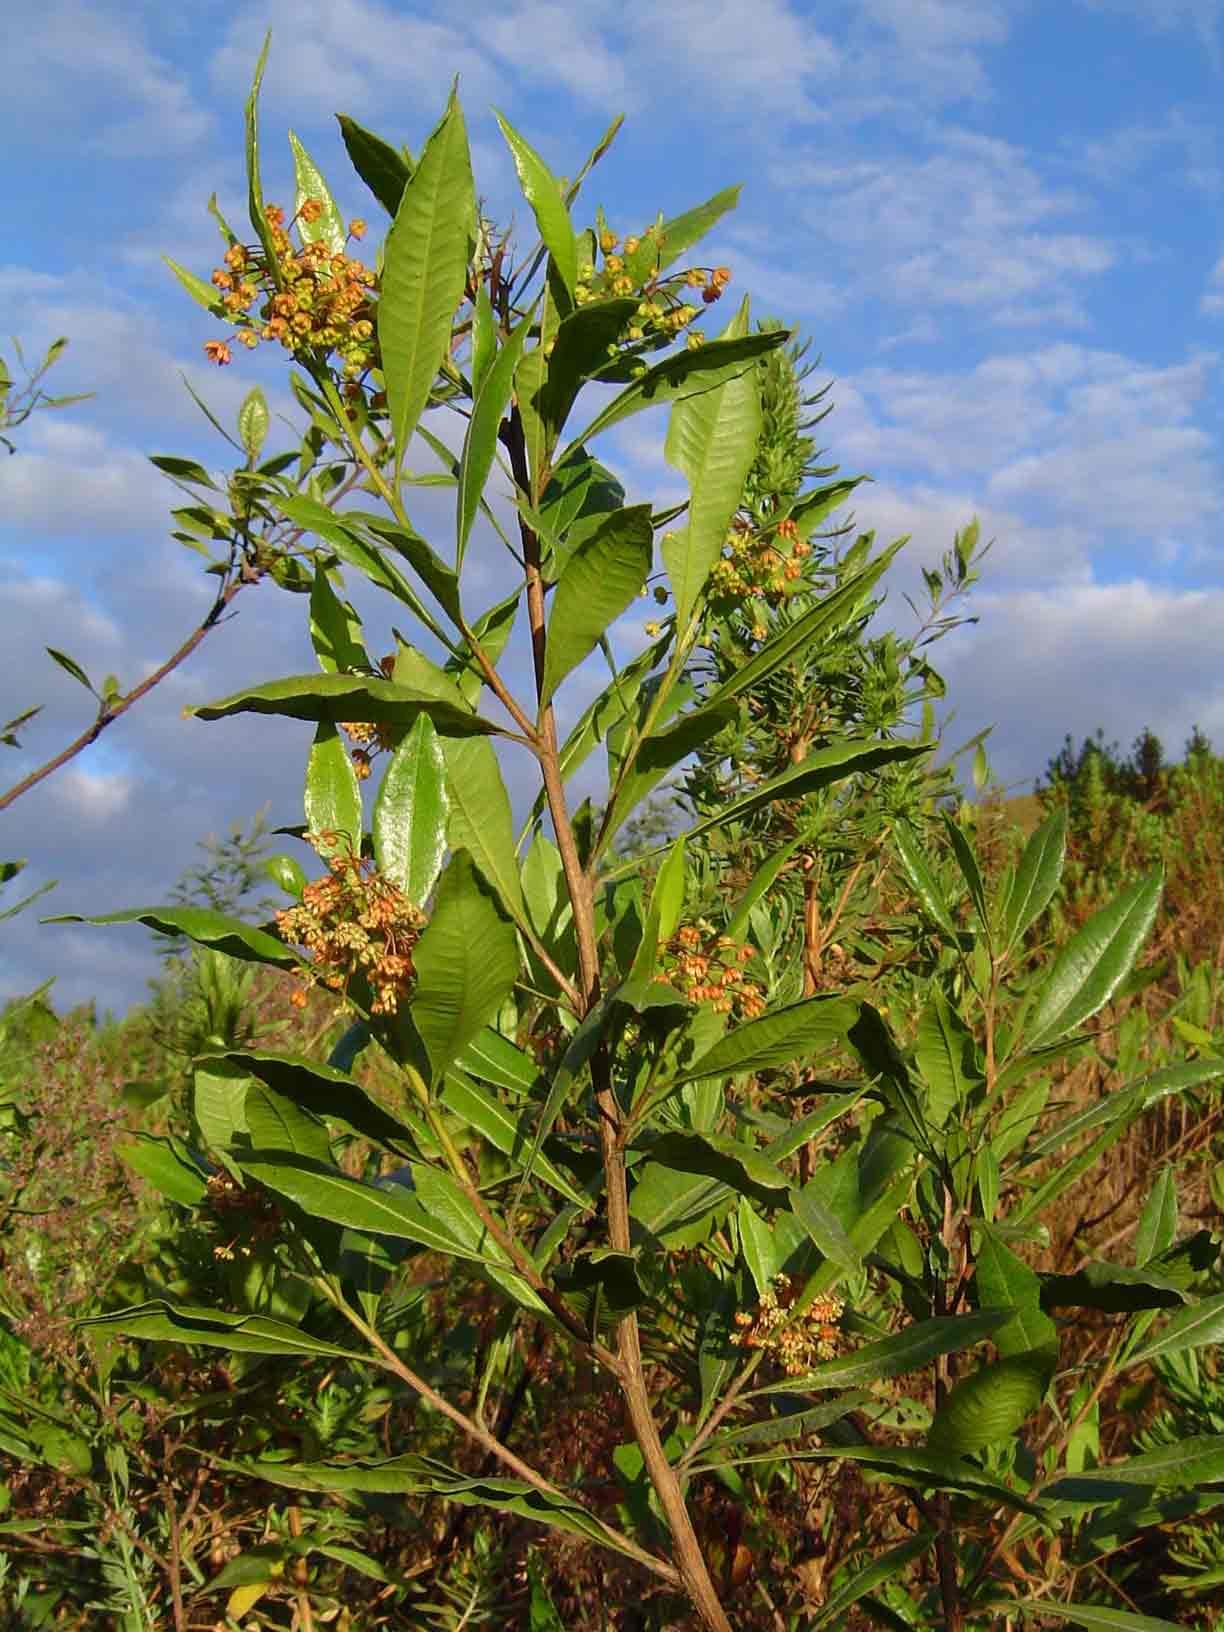 Dodonaea viscosa subsp. angustifolia